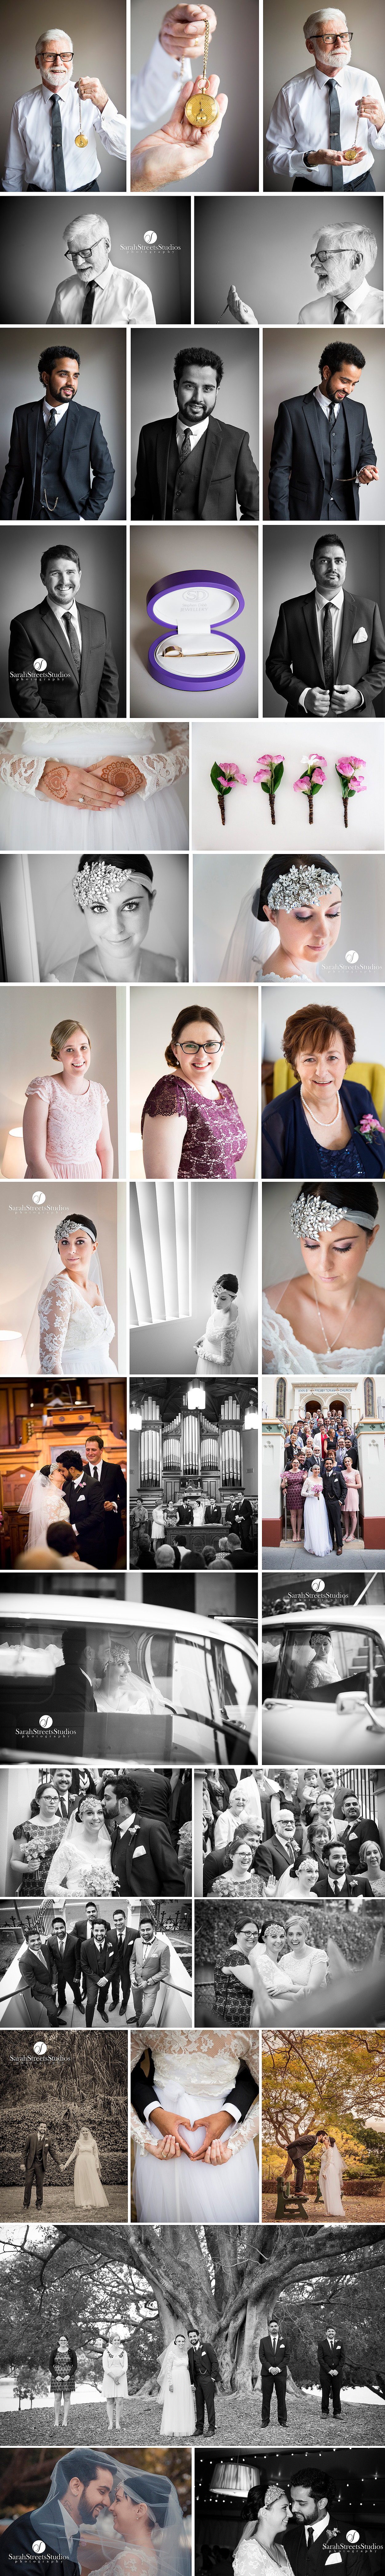 wedding photographers brisbane, new farm park wedding photography